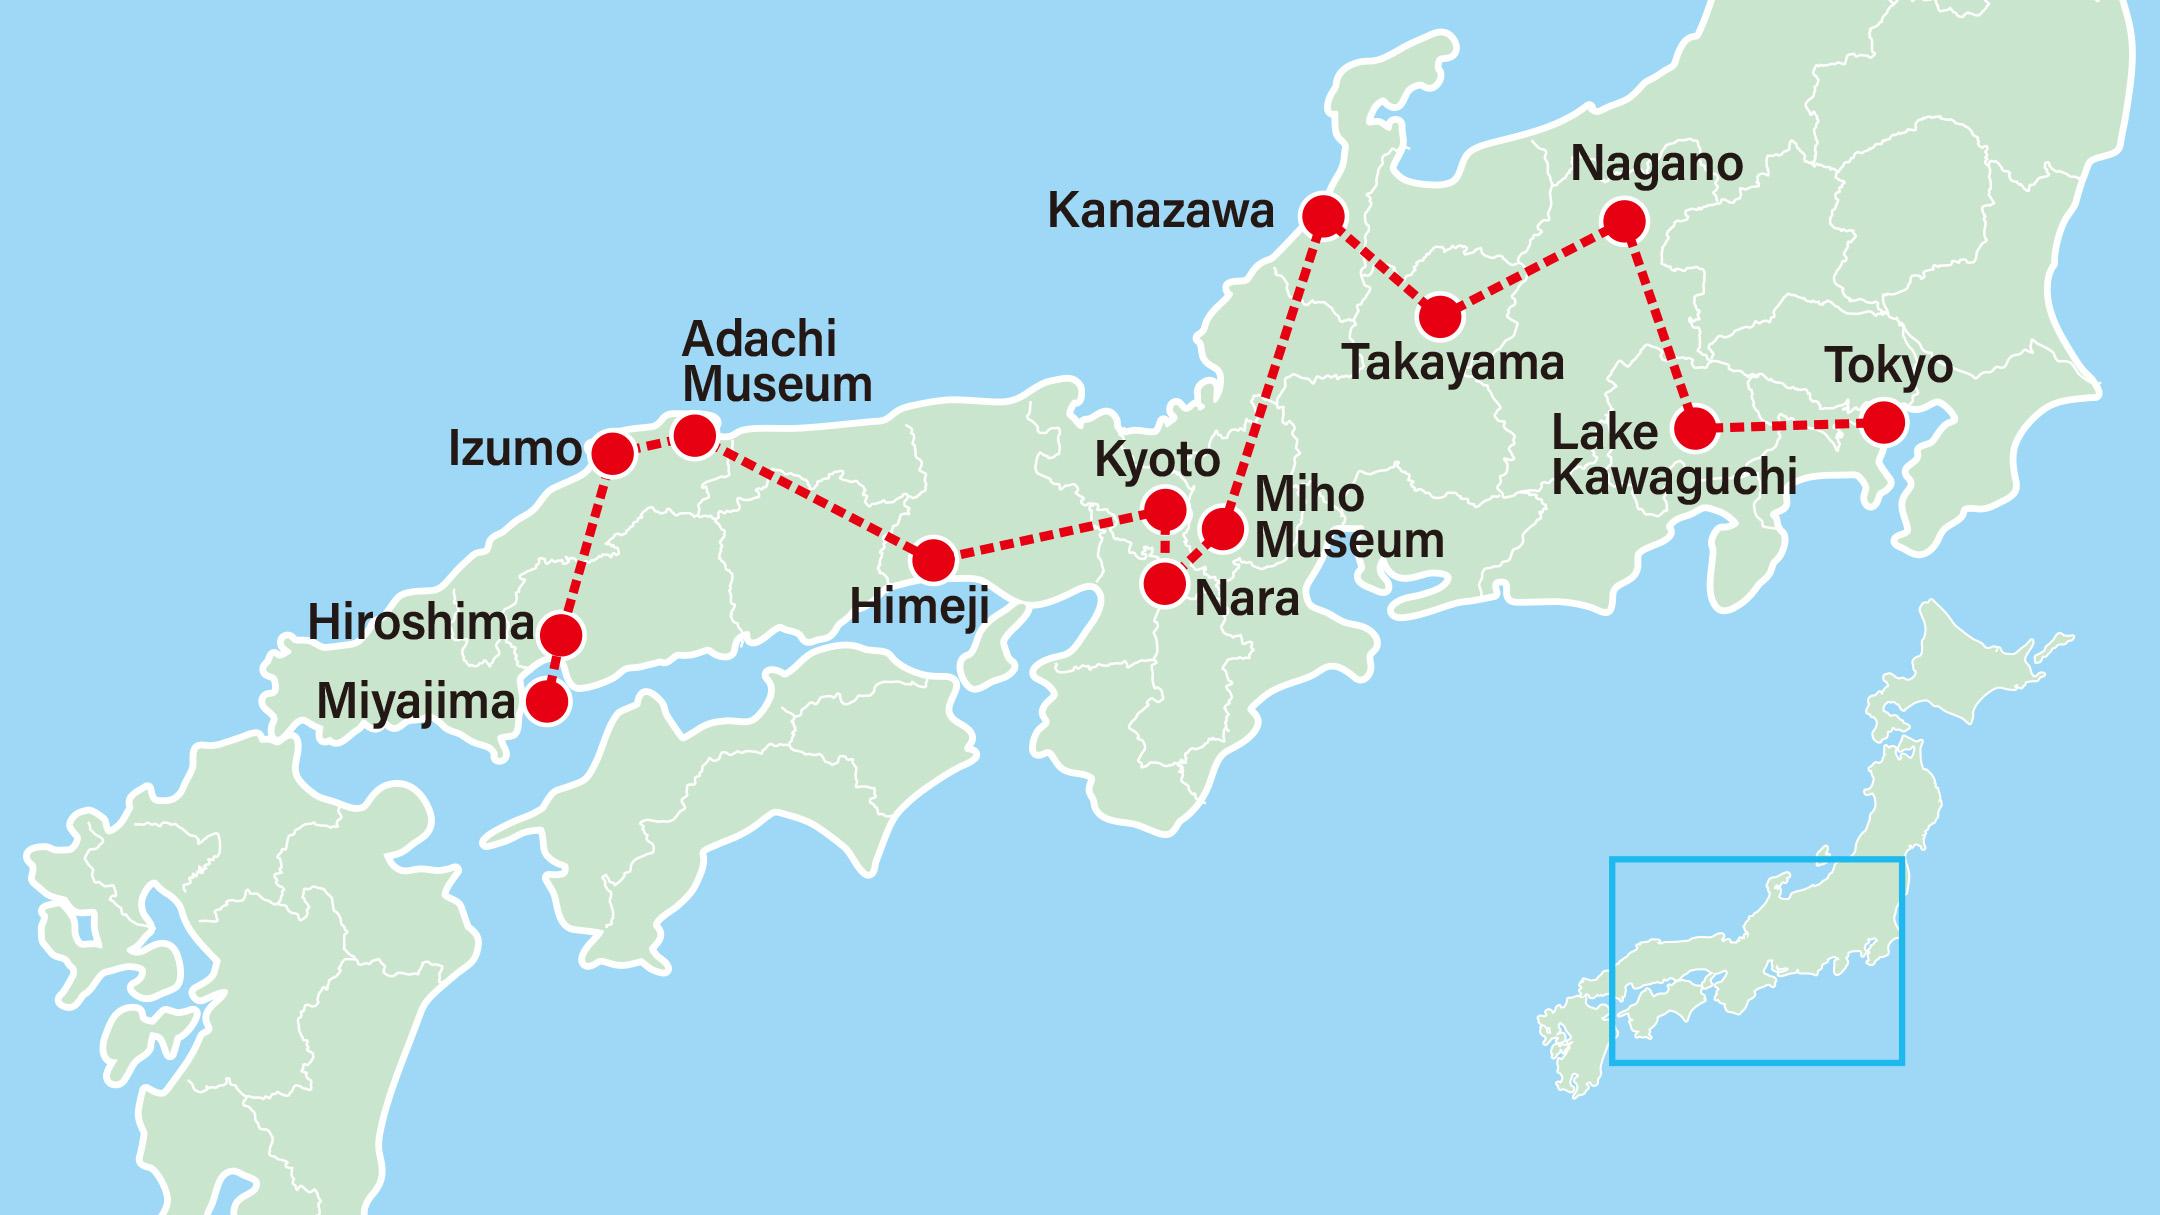 Takayama Spring Festival 10 Days-Tokyo-Lake Kawaguchi-Nagano-Takayama-Kanazawa-Miho Museum-Nara-Kyoto-Himeji-Adachi Museum-Hiroshima-Miyajima